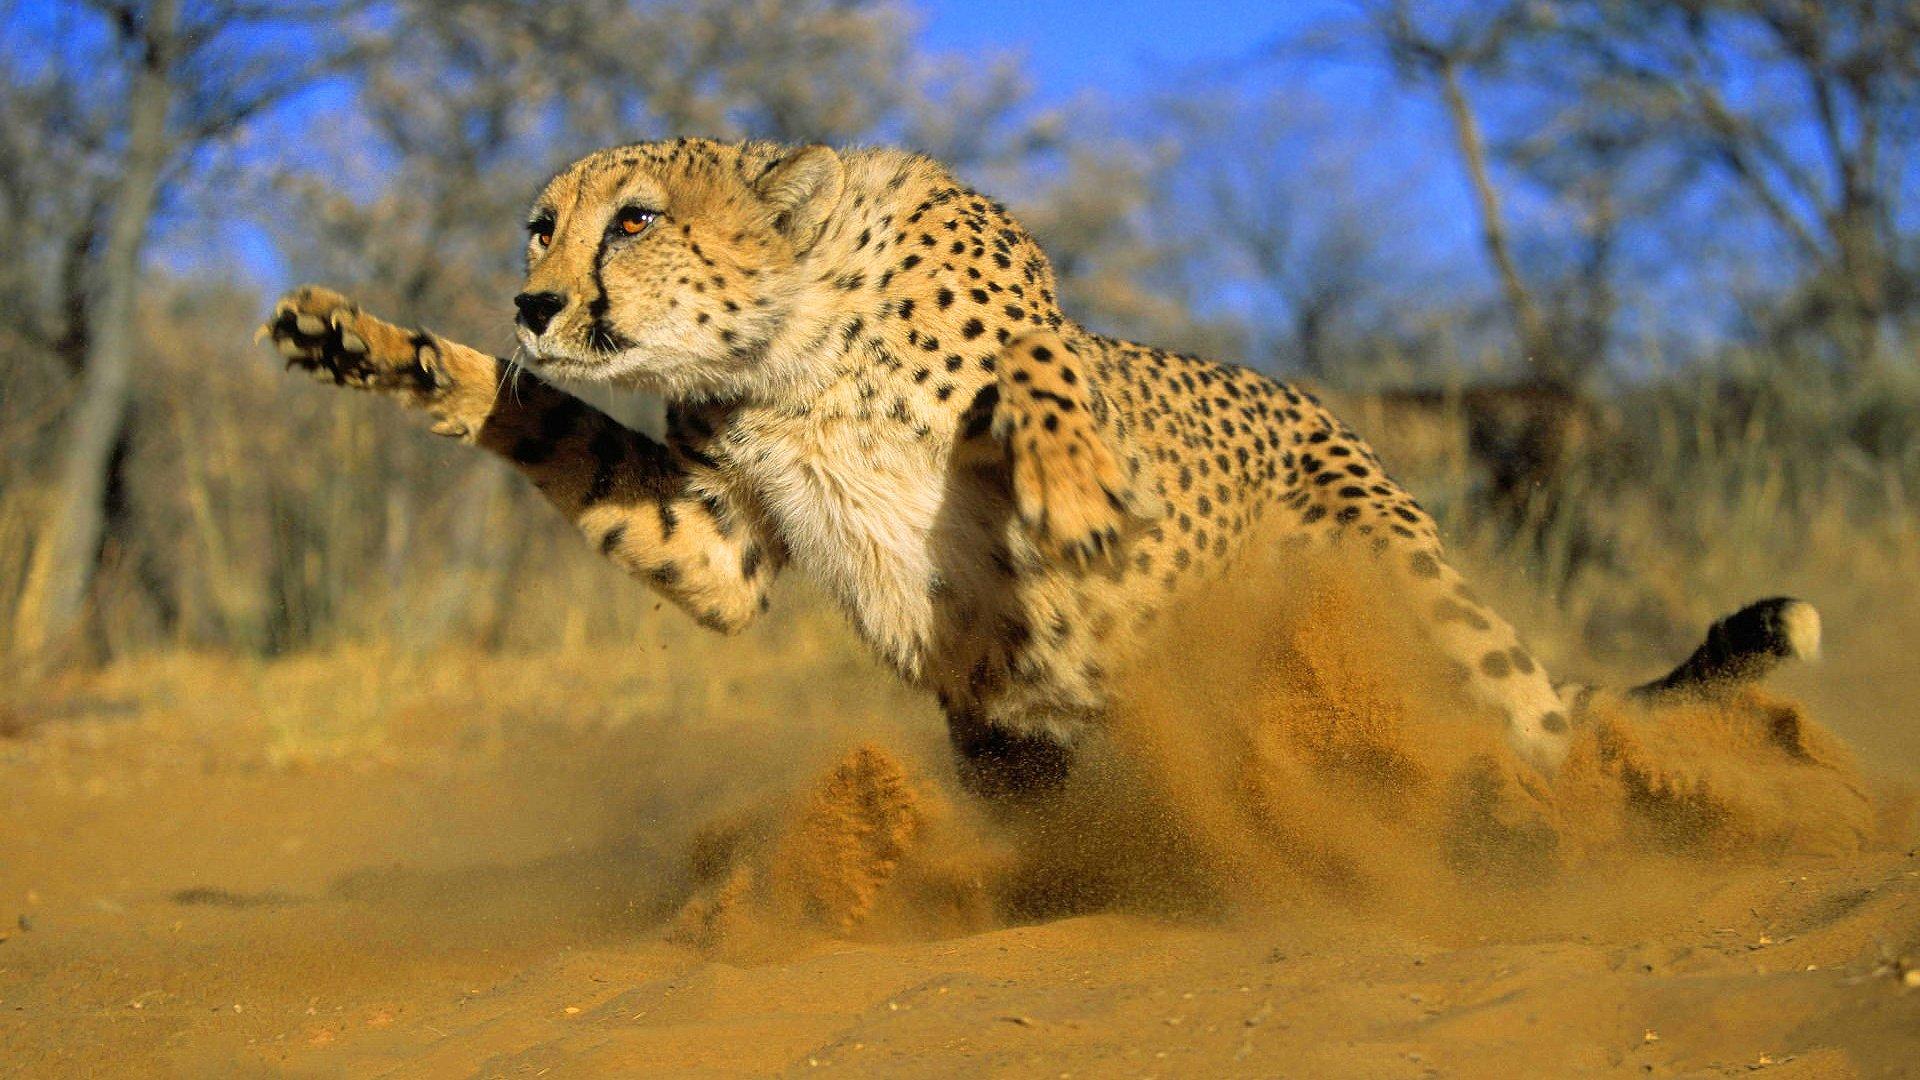 Animated Cheetah Wallpaper baby cheetah wallpapers background mytwiink baby cheetah